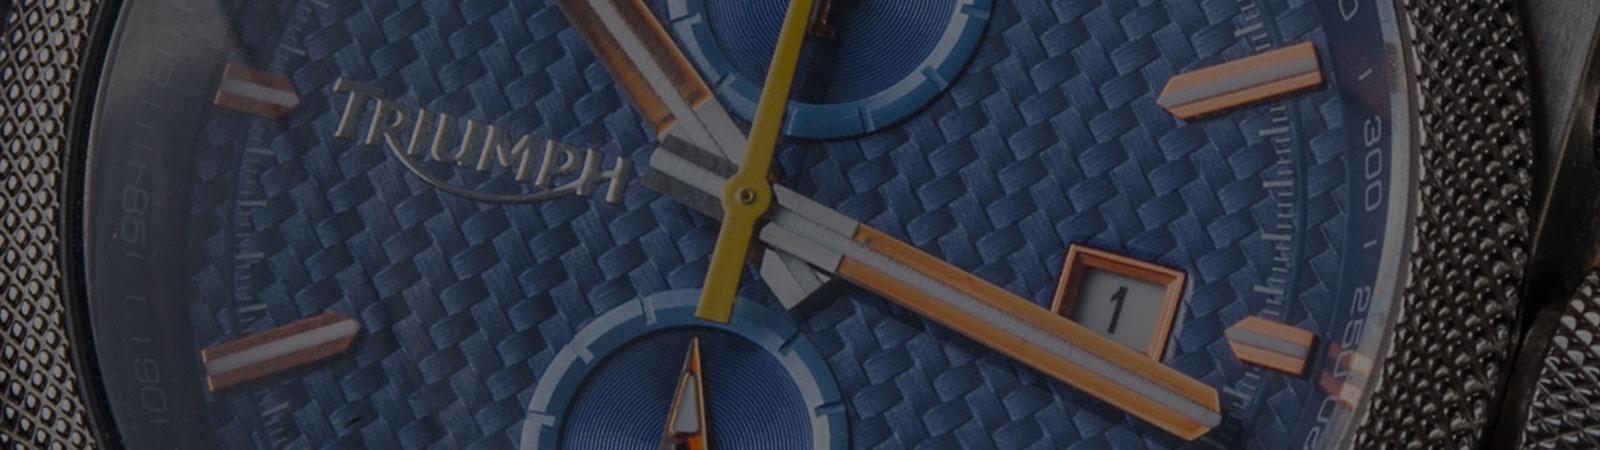 MEET THE WATCH: Triumph Scrambler Chronograph with Carbon Fiber Dial